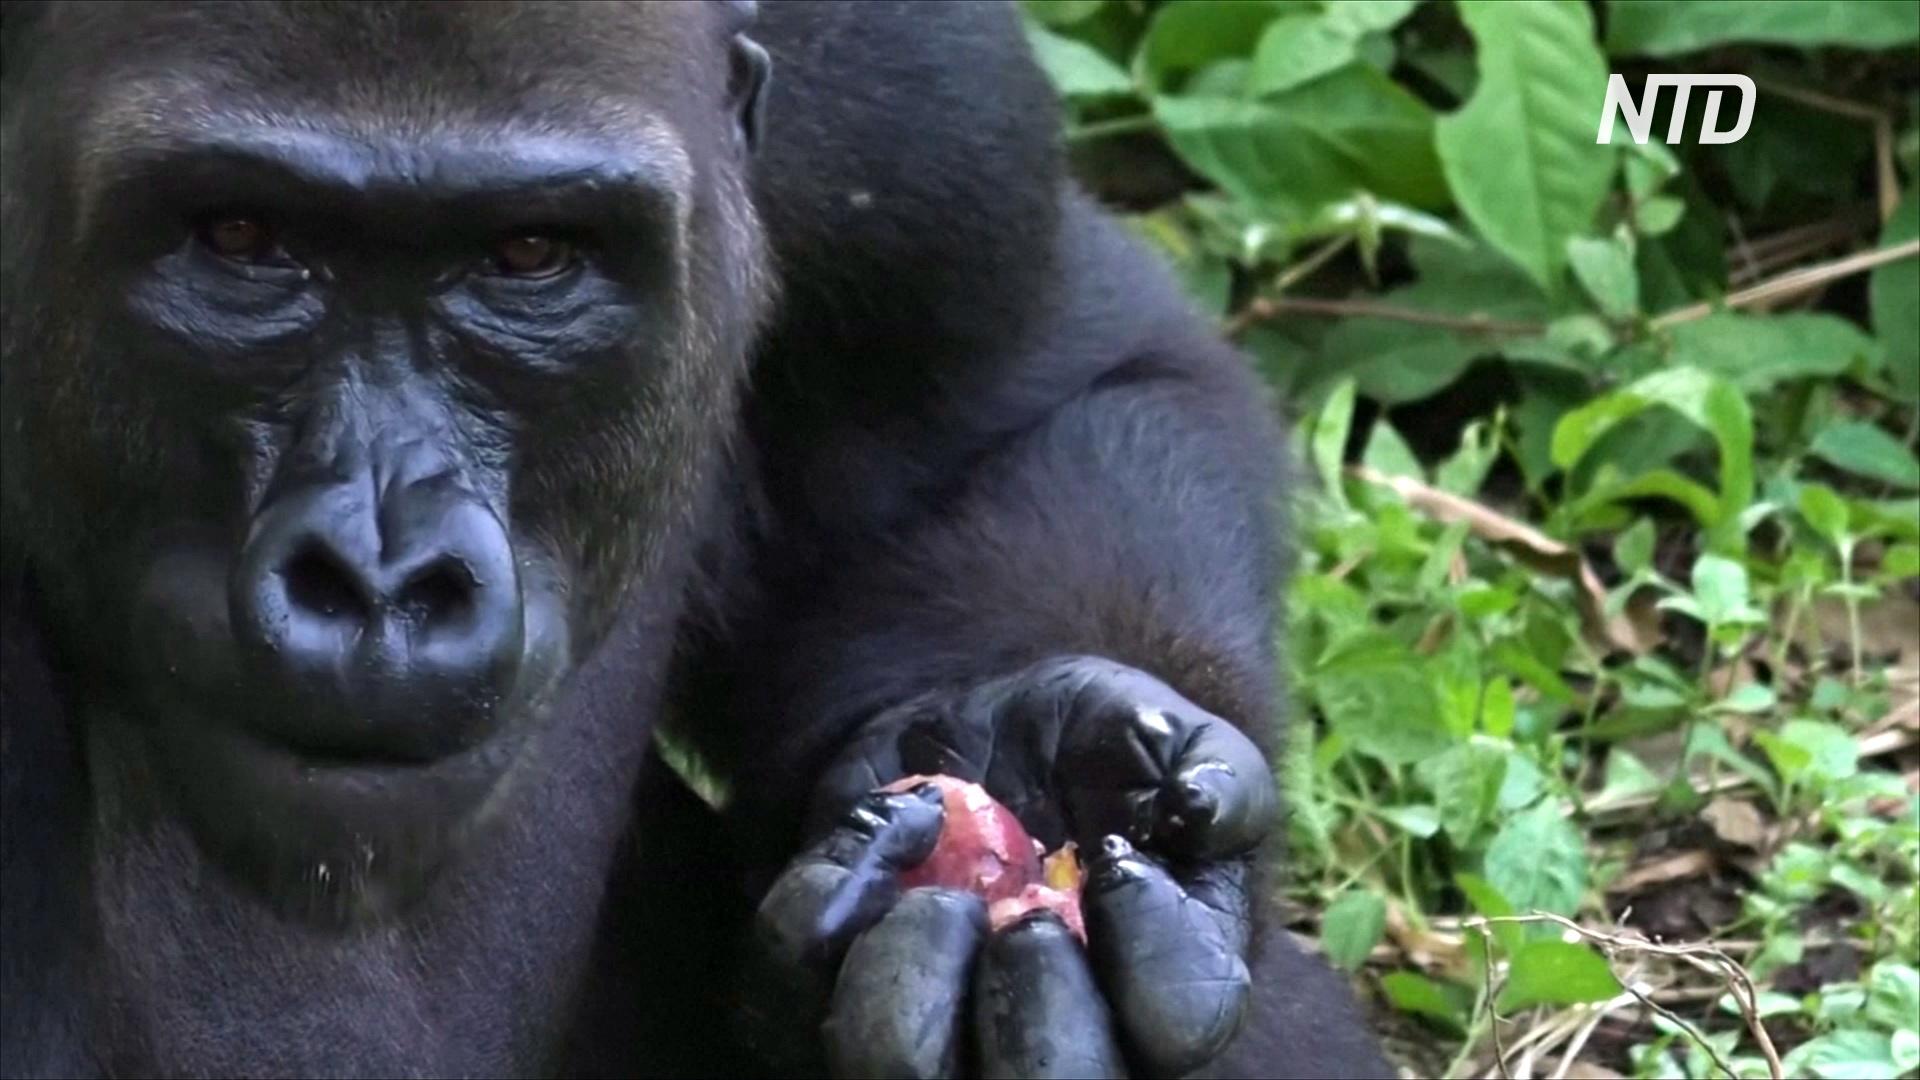 Центру приматов в Камеруне не хватает денег из-за карантина